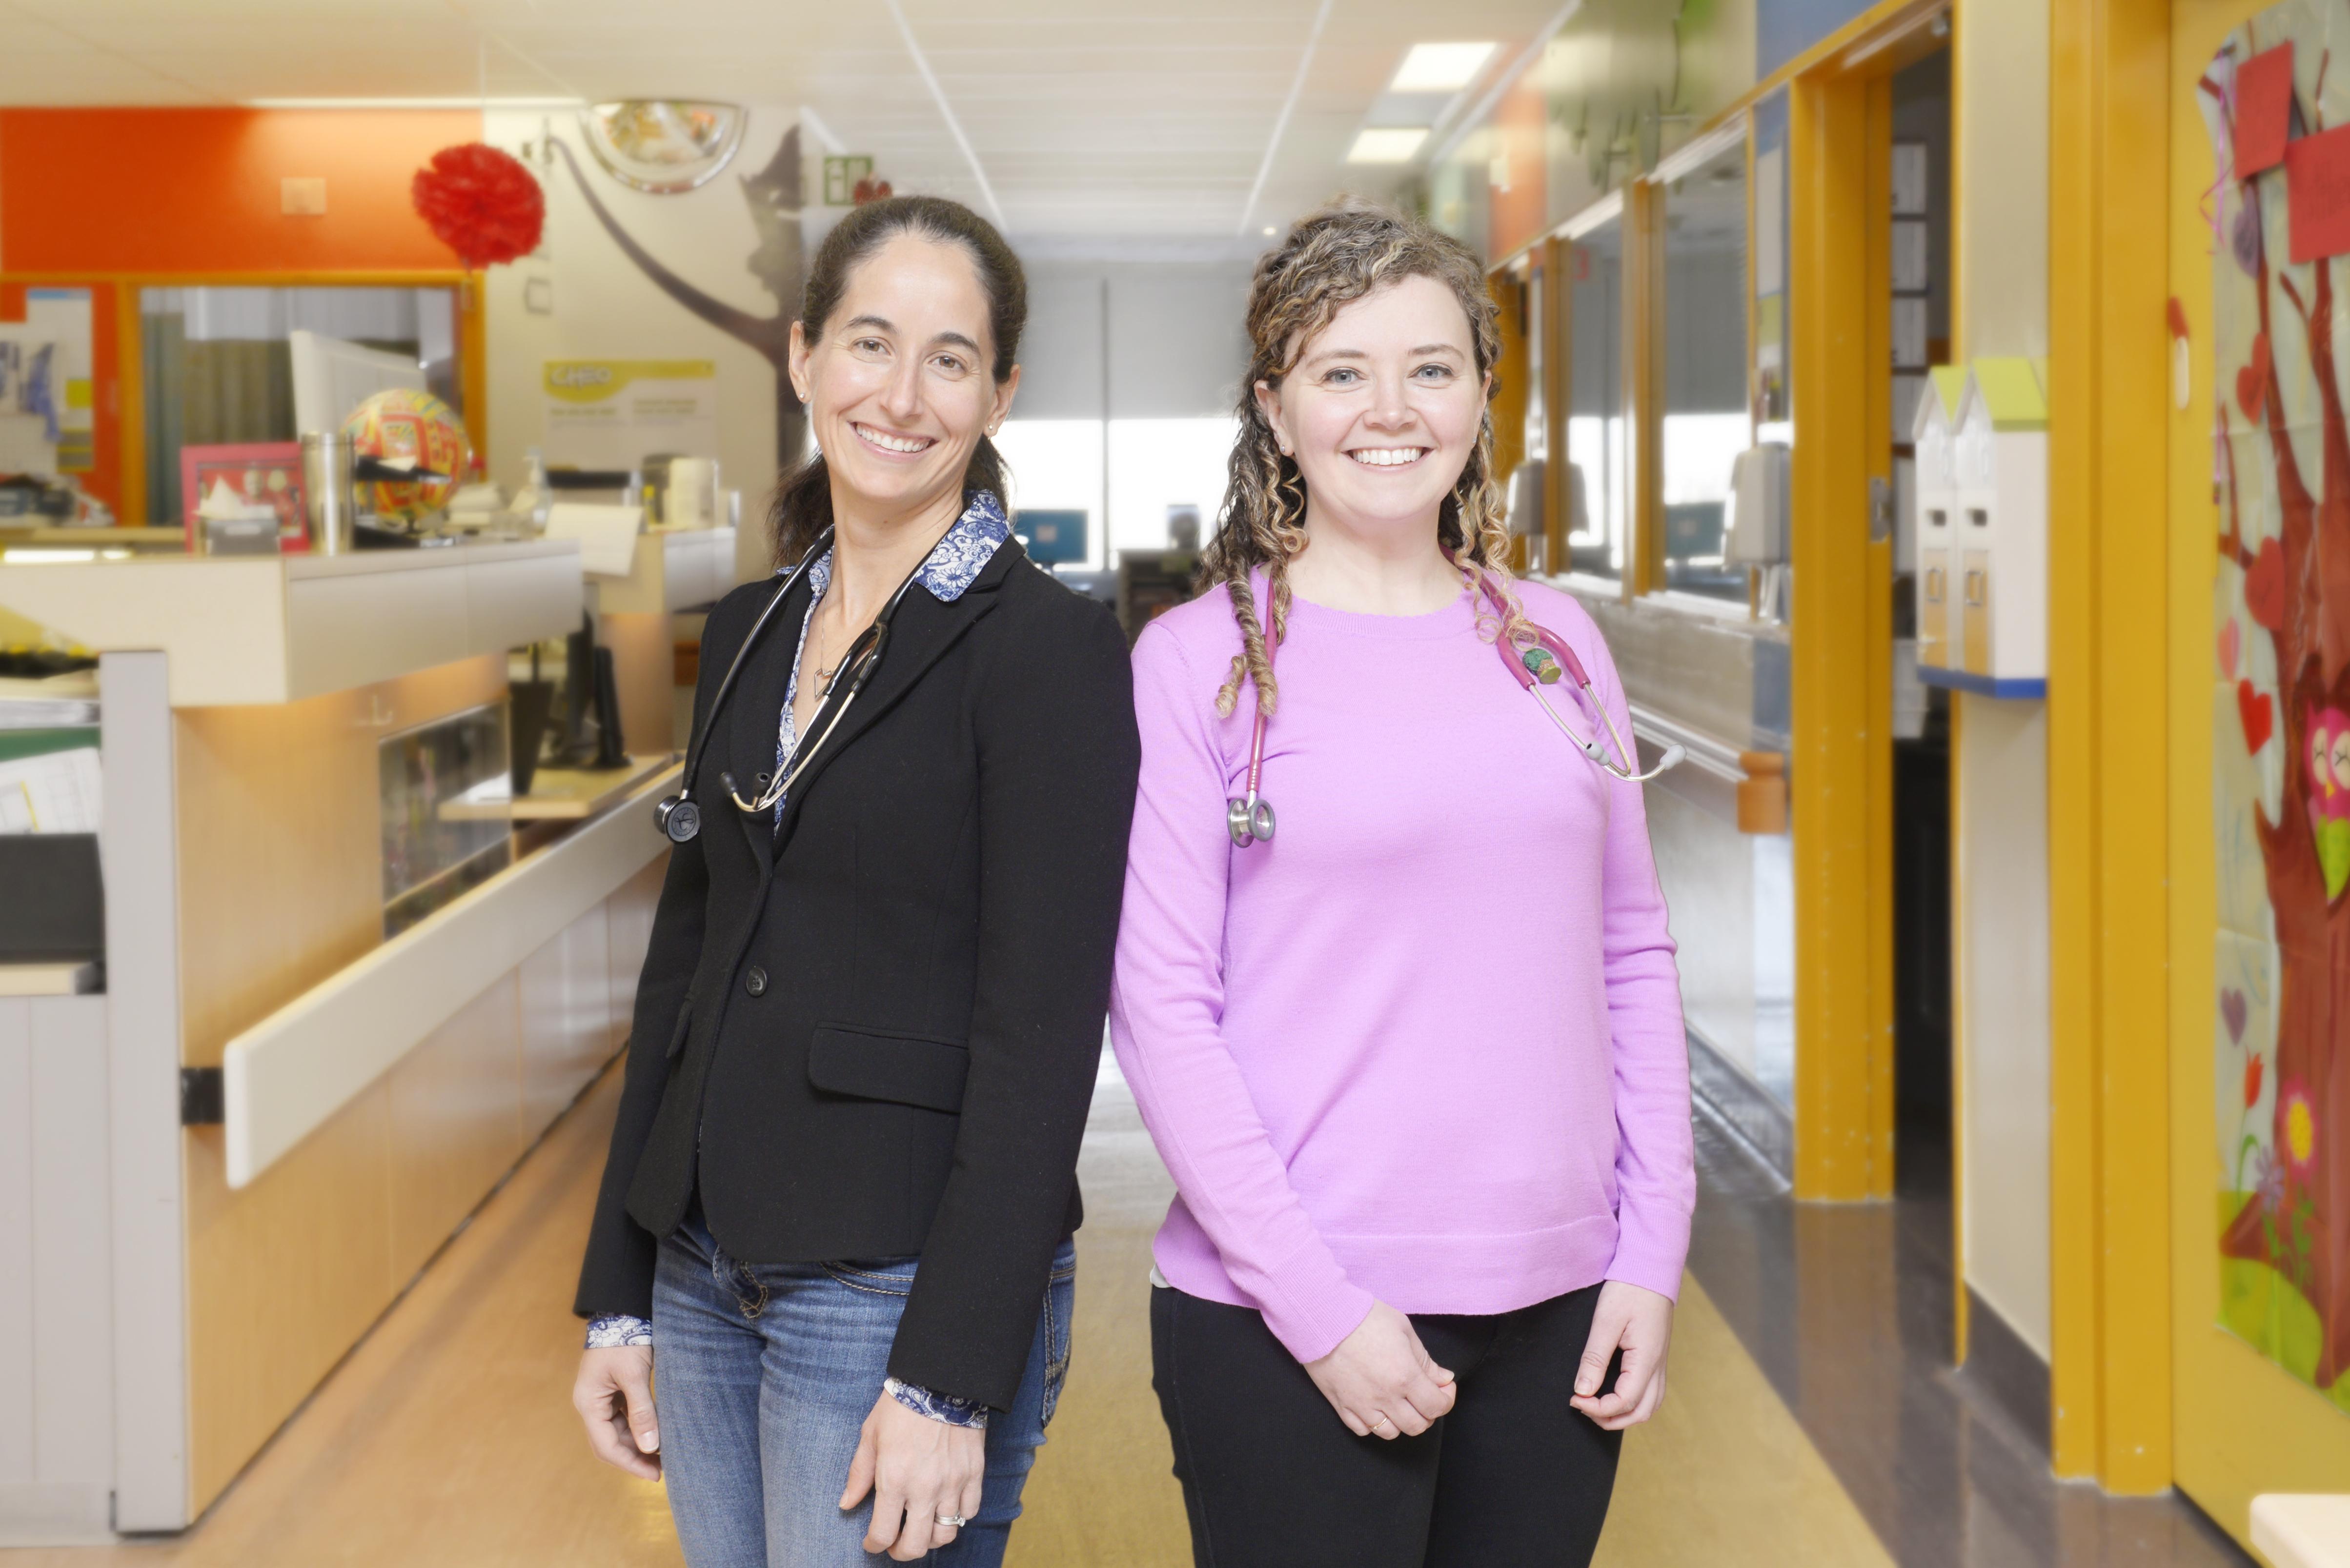 Dr. Catherine Pound and Dr. Victoria Gelt